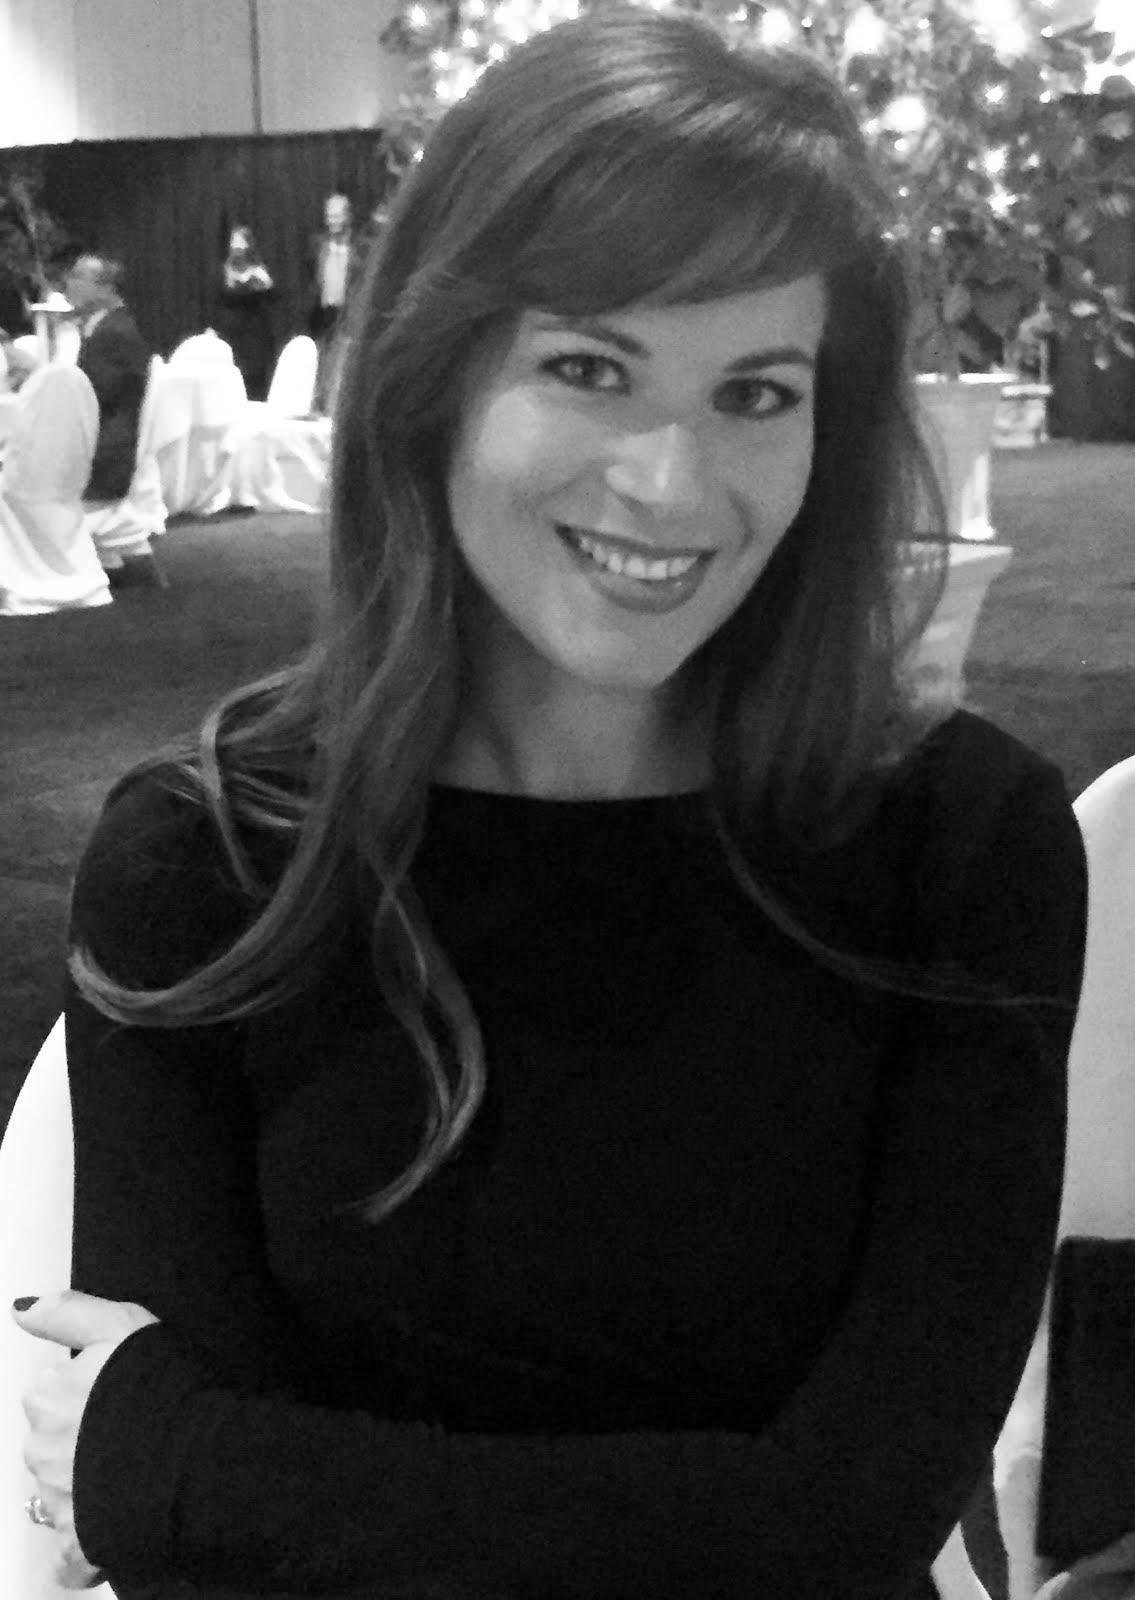 Amanda Antinore